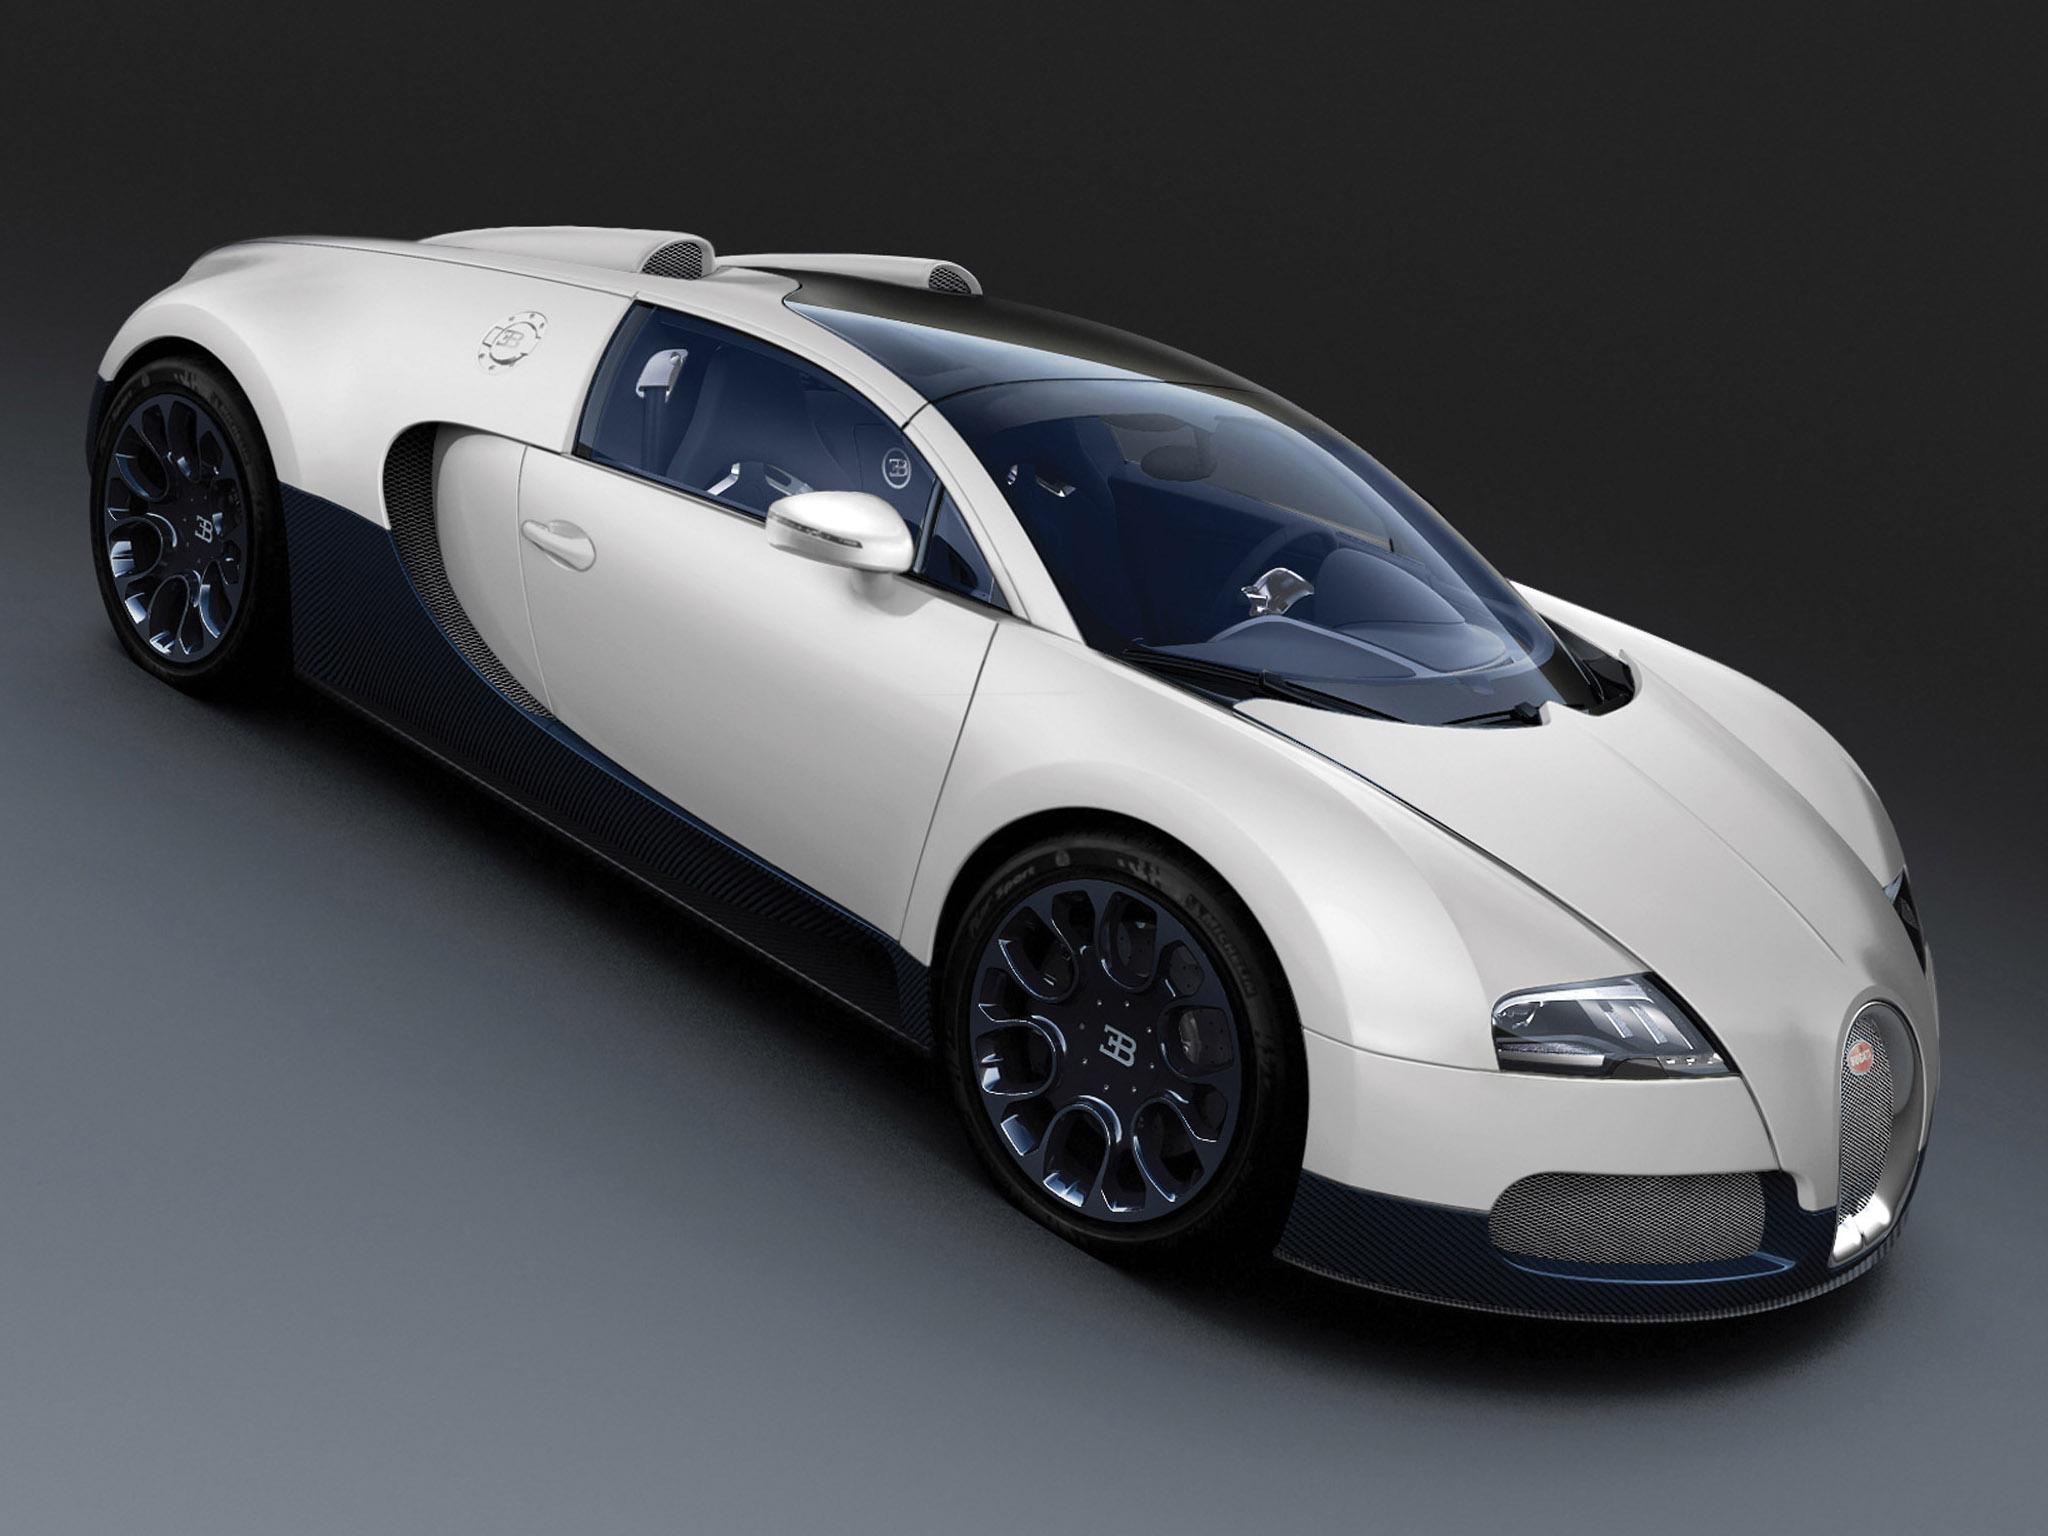 bugatti veyron grand sport shanghai edition 2011 bugatti. Black Bedroom Furniture Sets. Home Design Ideas